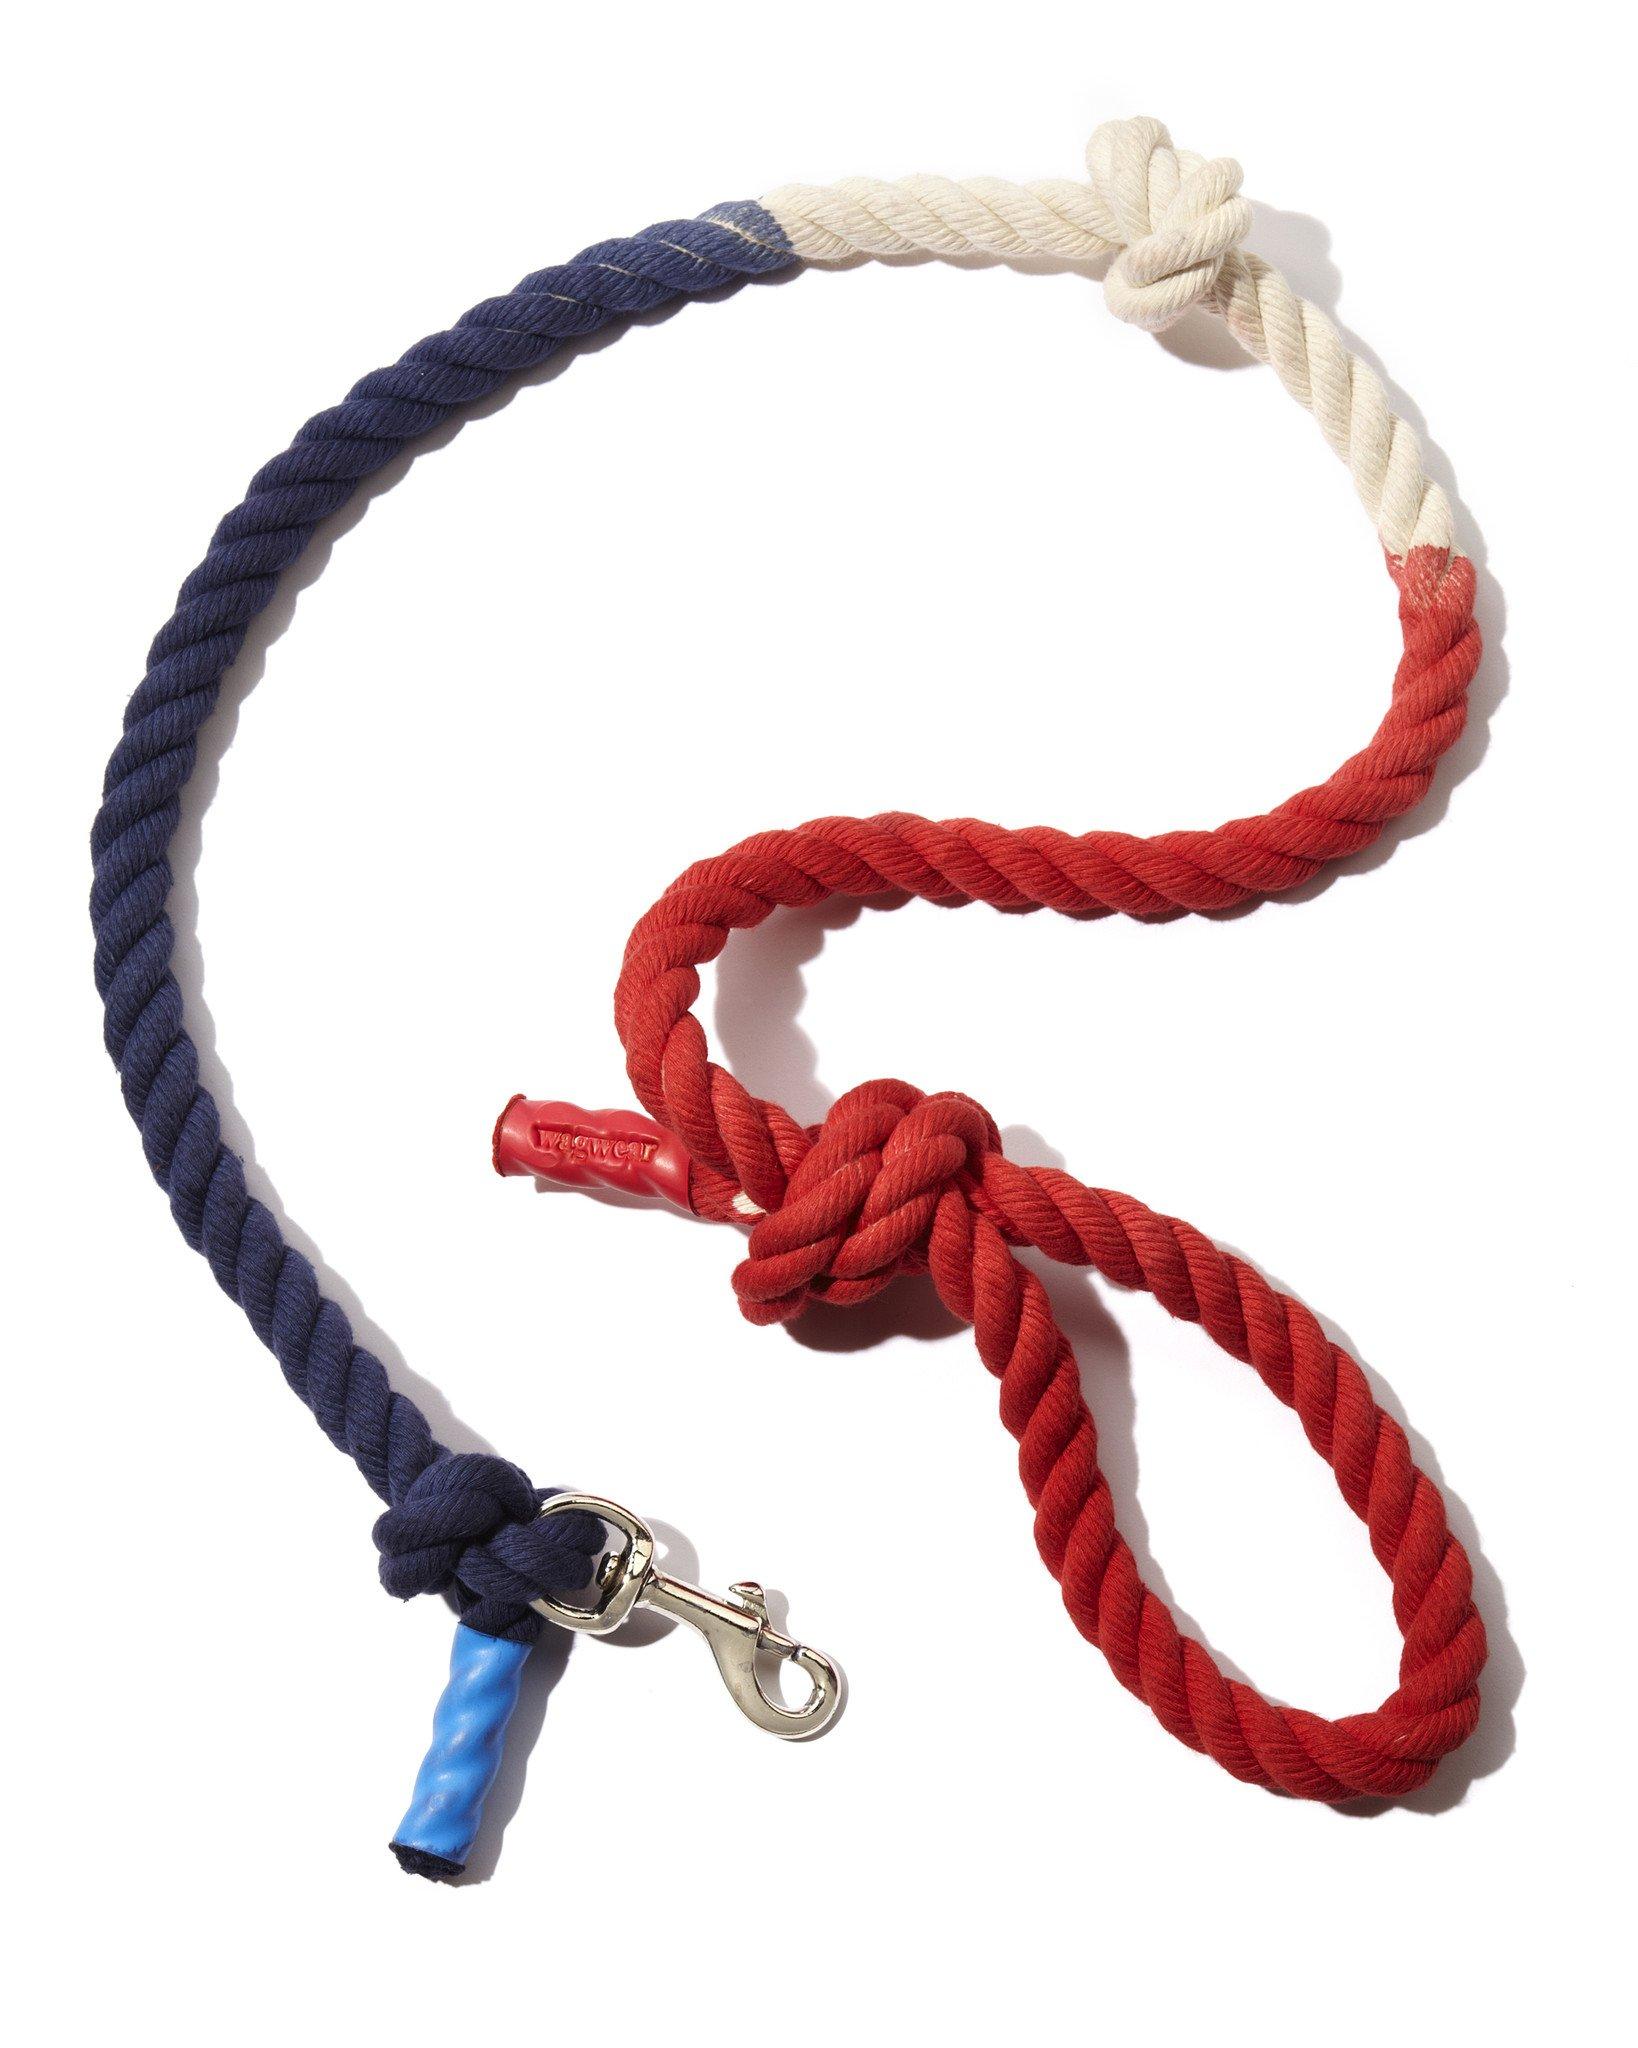 Knot Leash